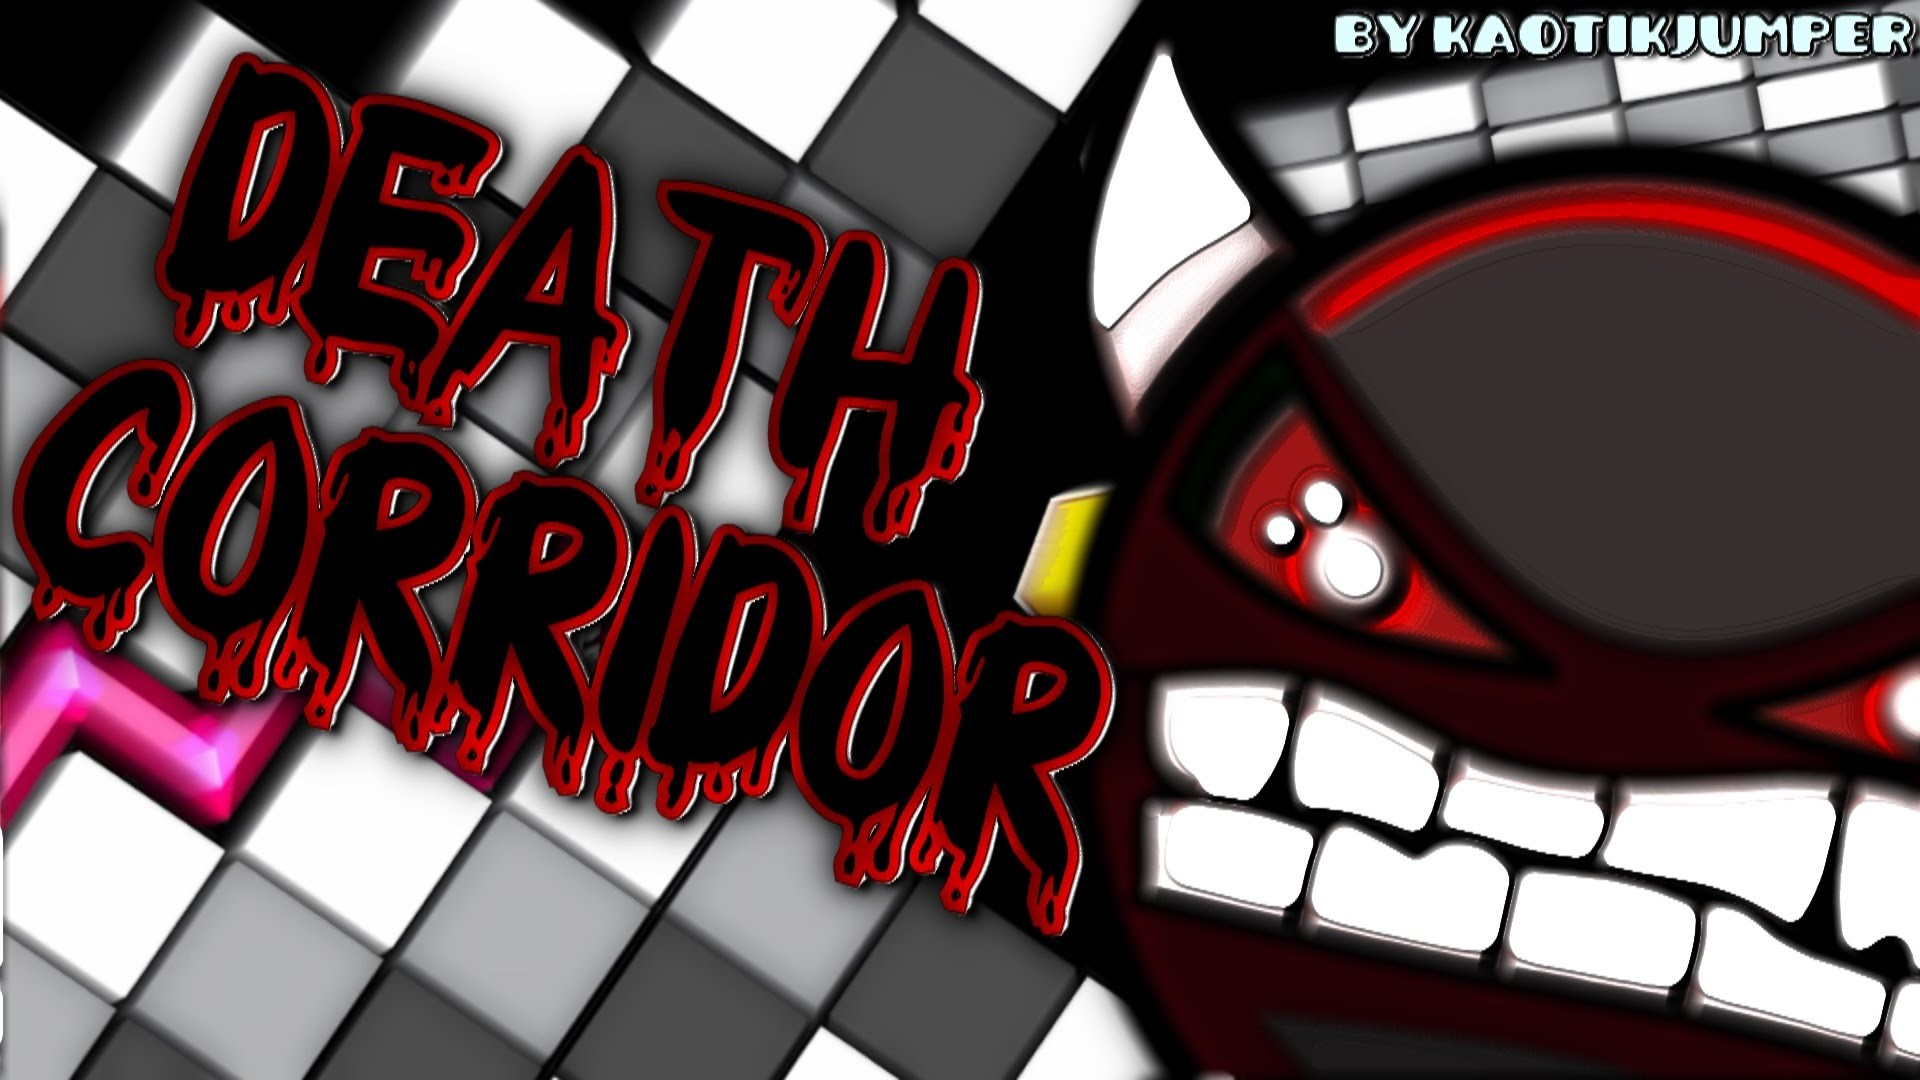 Geometry Dash – DEATH CORRIDOR (Original) 100% – by KaotikJumper  (Impossible) – YouTube